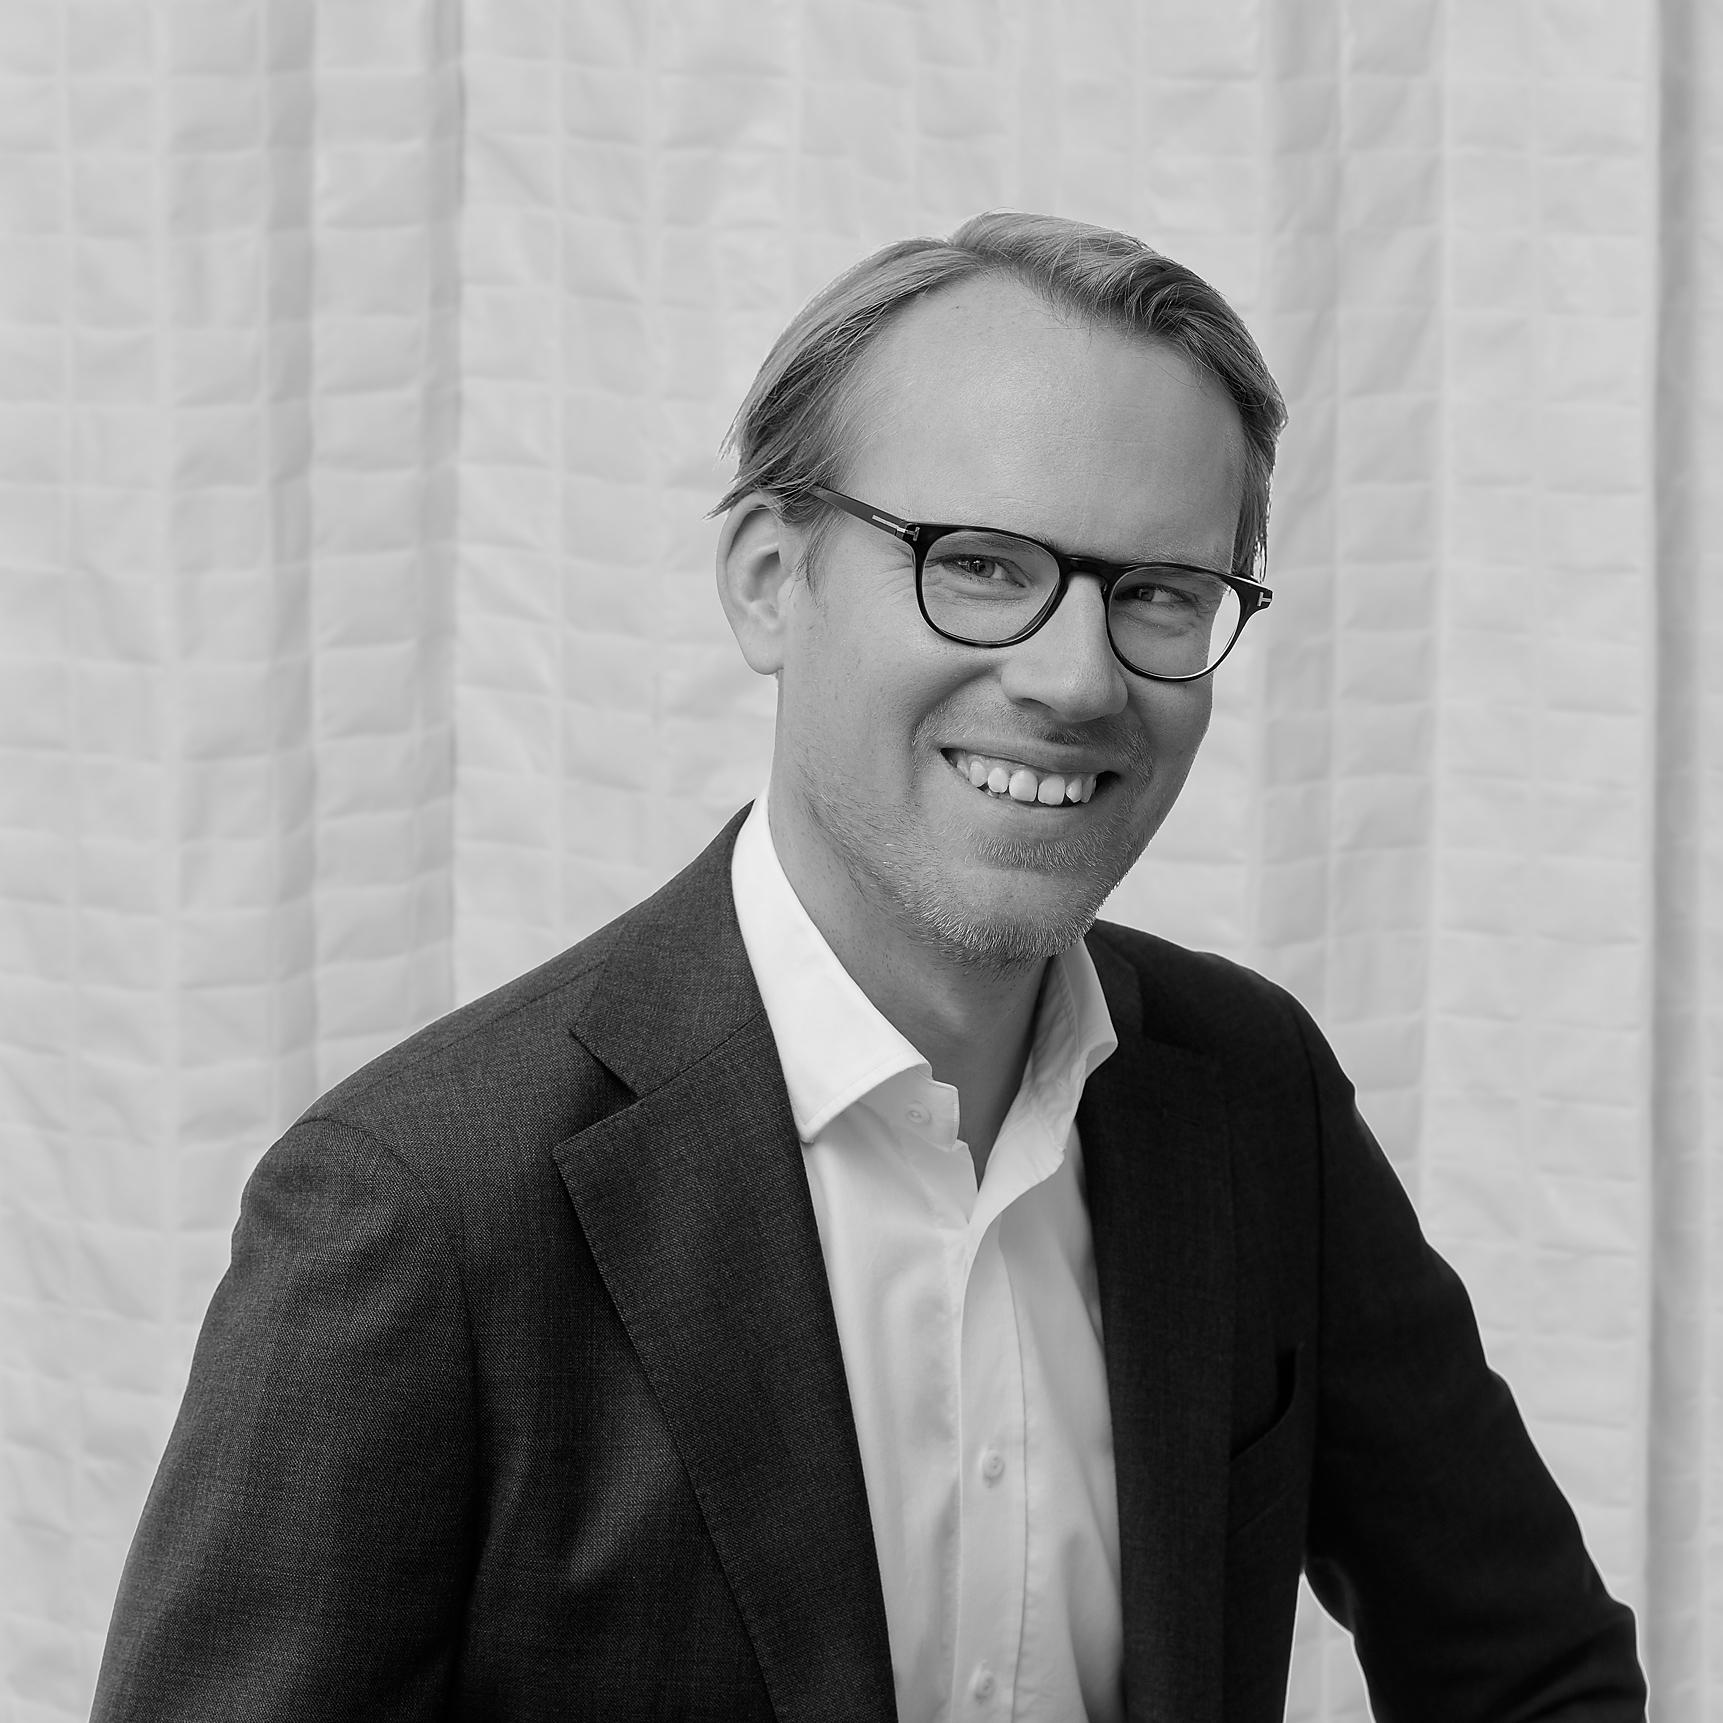 David Hävermark